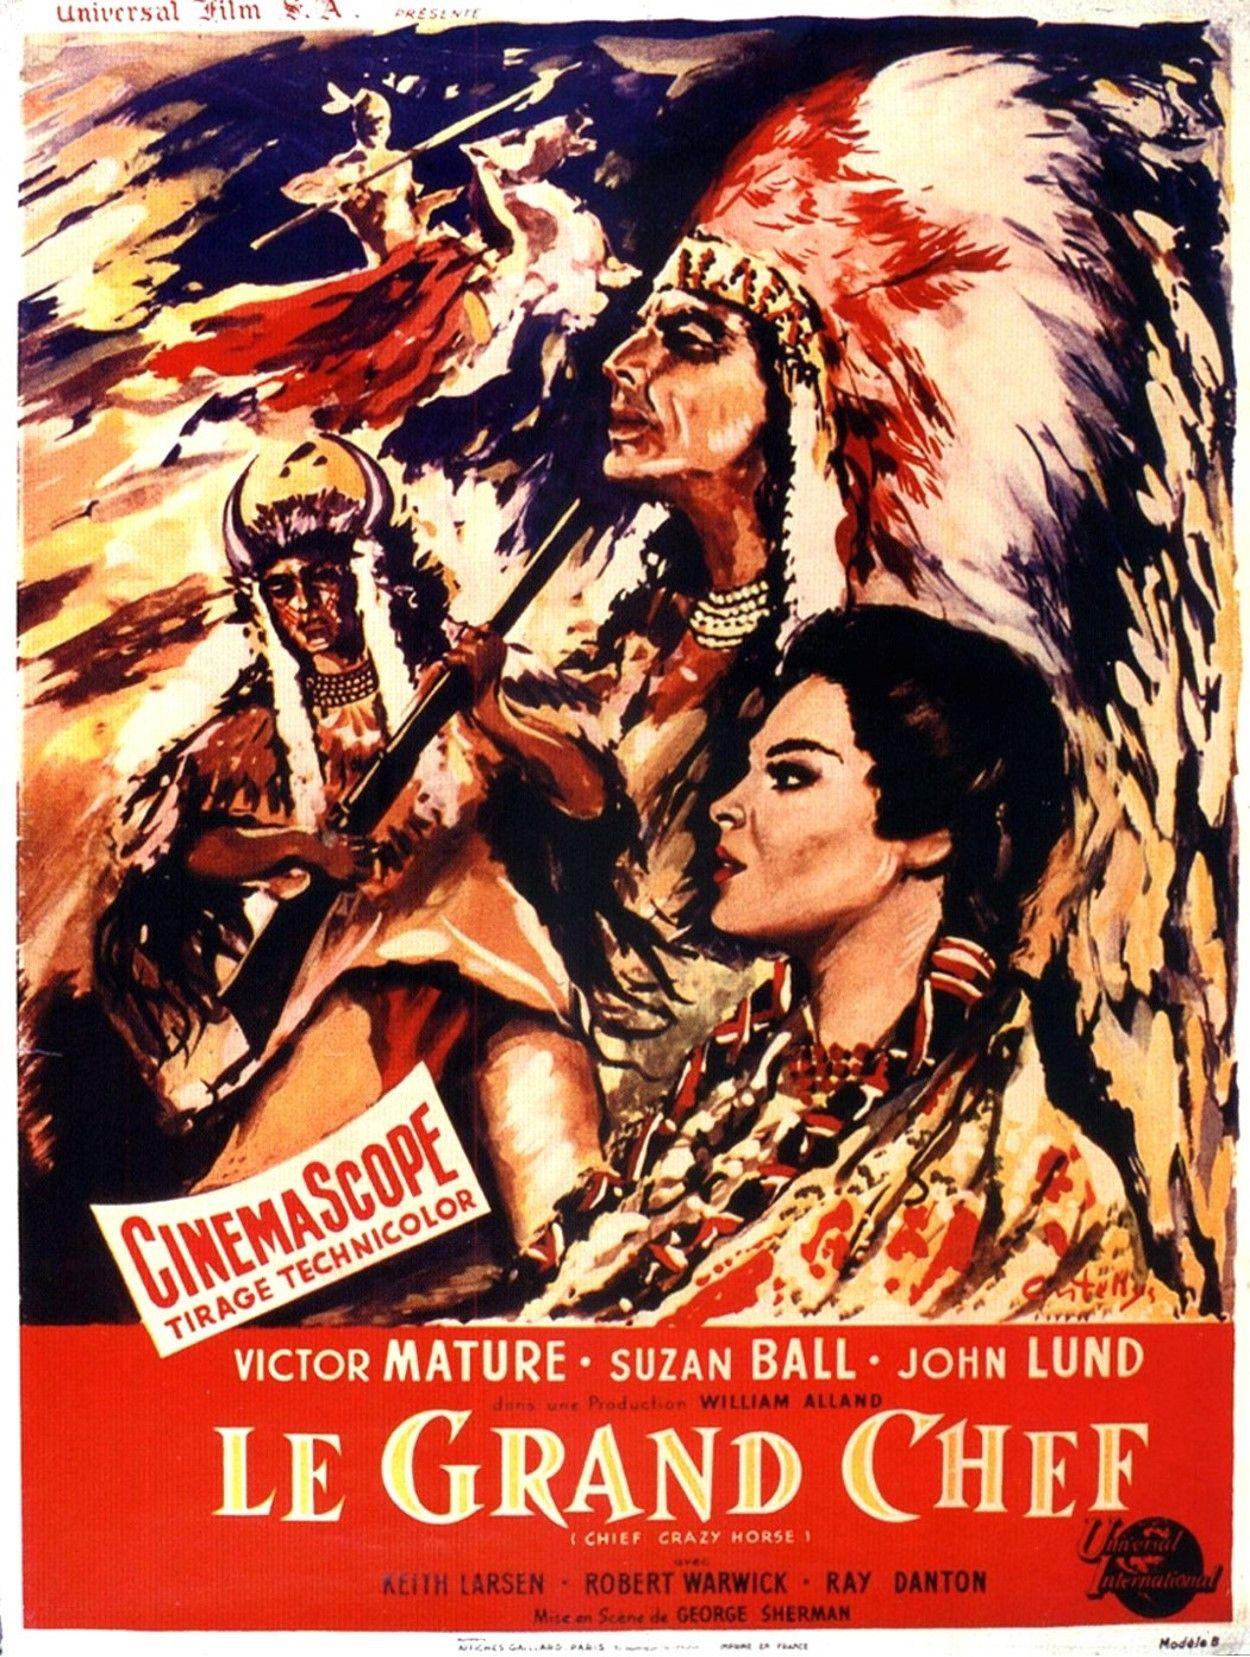 Le Grand Chef Film 1955 Senscritique